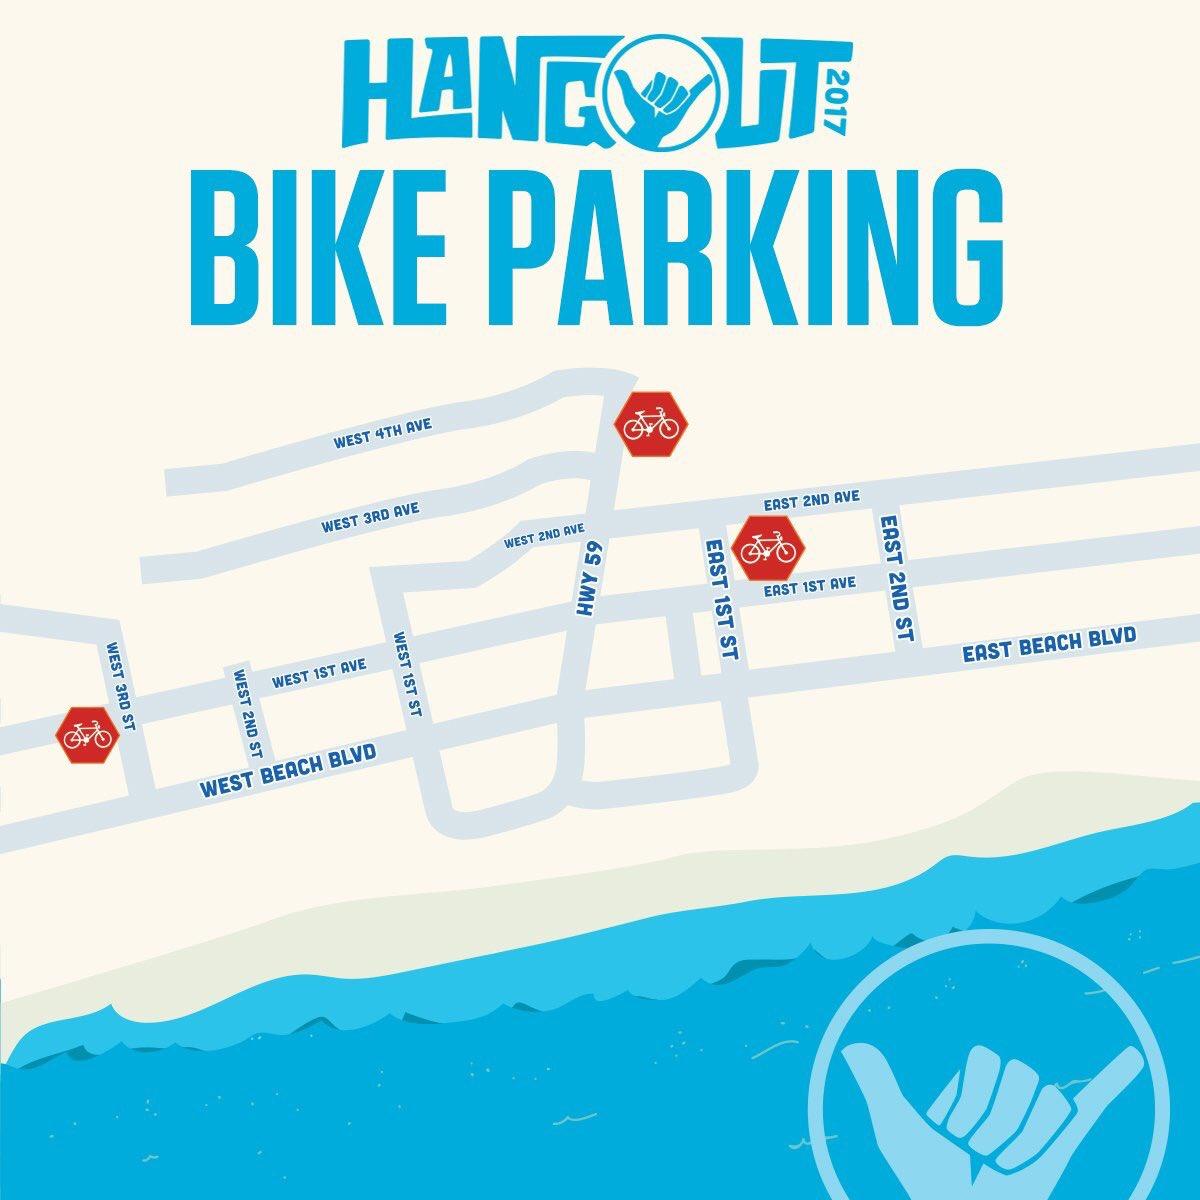 Hangout Bike Parking